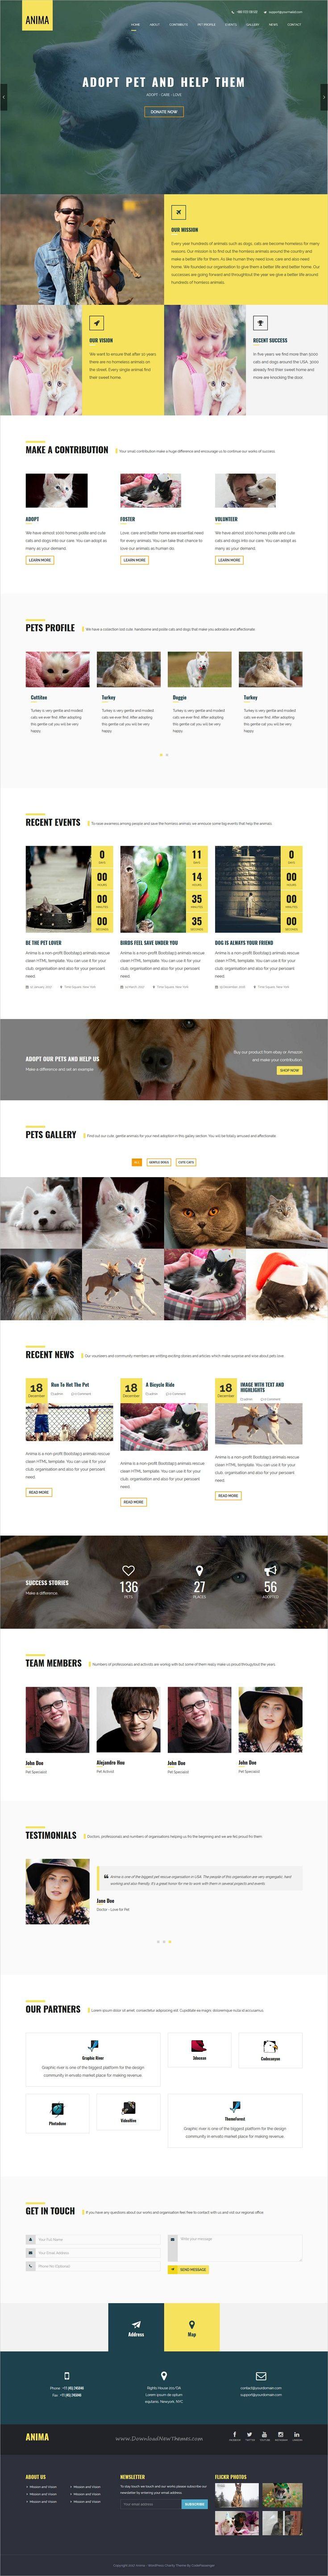 Anima is a responsive #WordPress theme for #pet rescue, #animal shelter, #charity, fundraising or non-profit organization websites download now➩ https://themeforest.net/item/cooper-creative-responsive-personal-portfolio-wordpress-theme/19301592?ref=Datasata